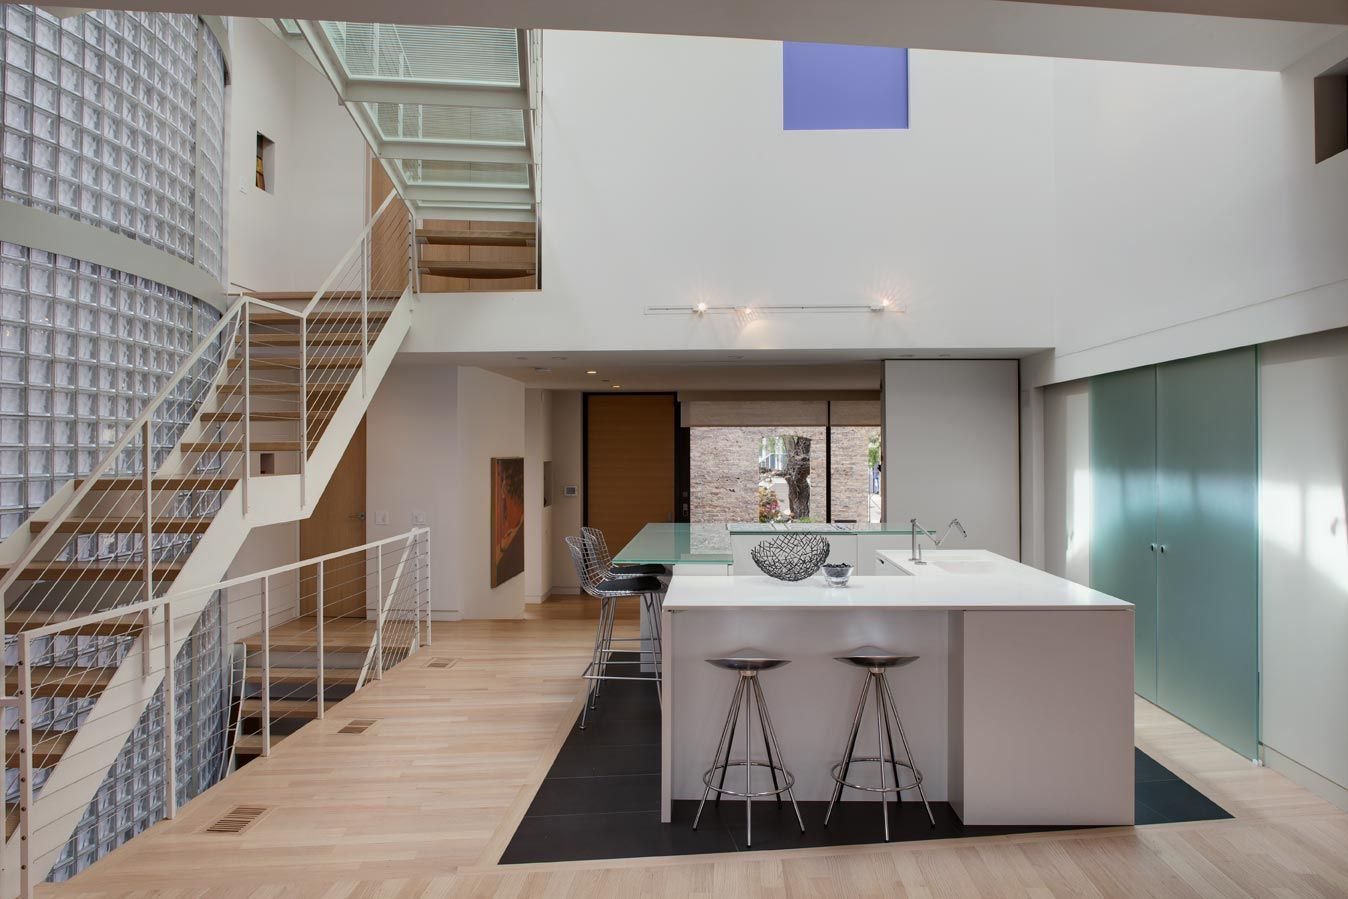 Kitchen design by thomas hickey associates modern